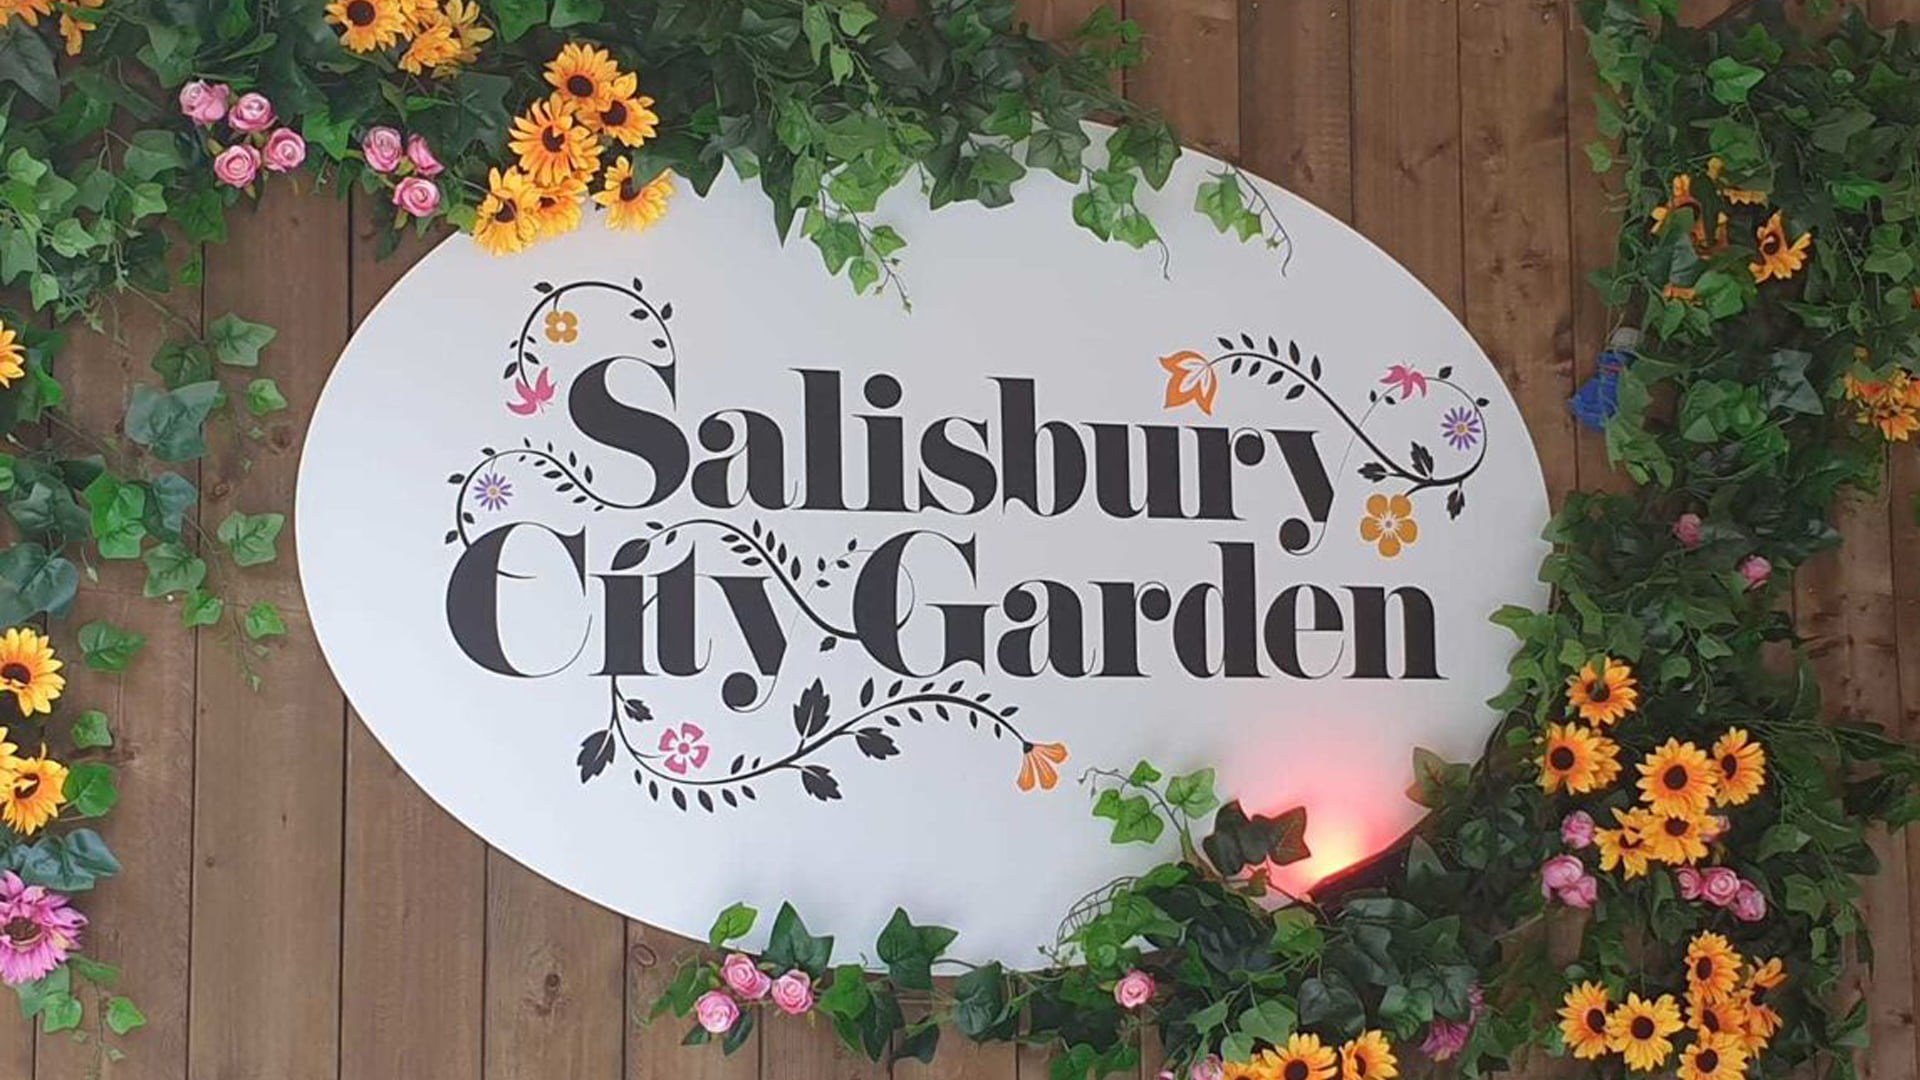 Aegis Security Support providing security for Salisbury City Garden Pop-up Bar